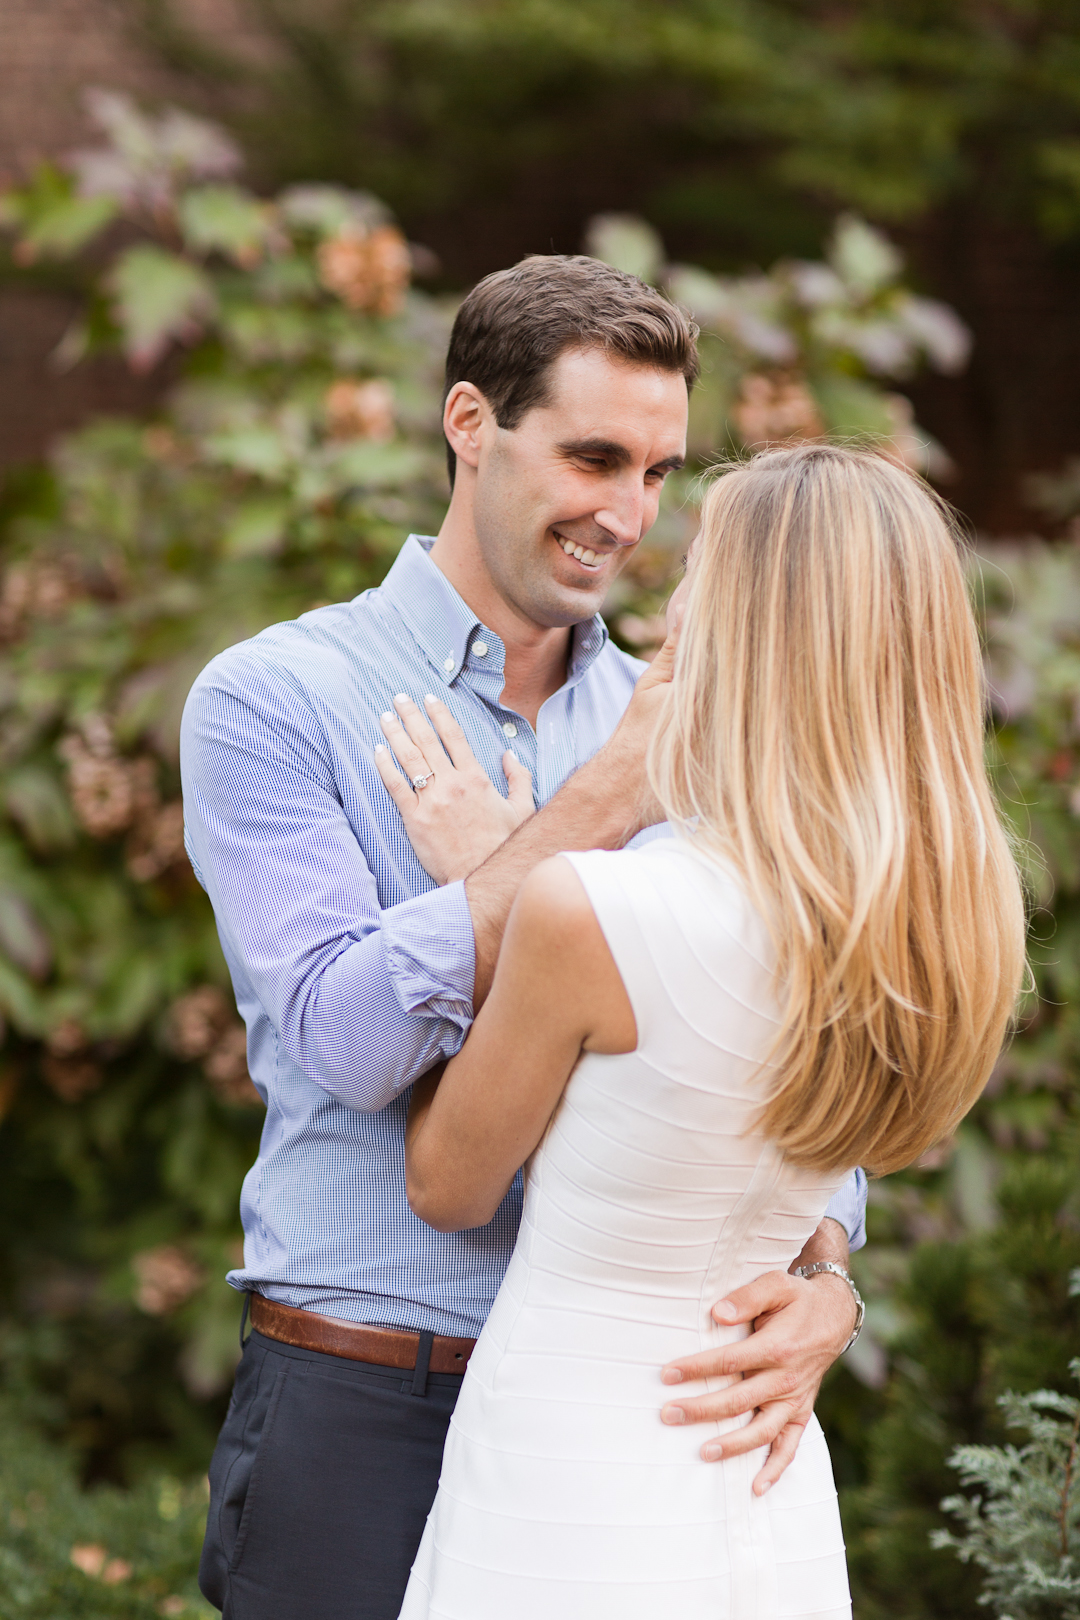 Melissa Kruse Photography - Daniece & Chris West Village Engagement Photos-106.jpg